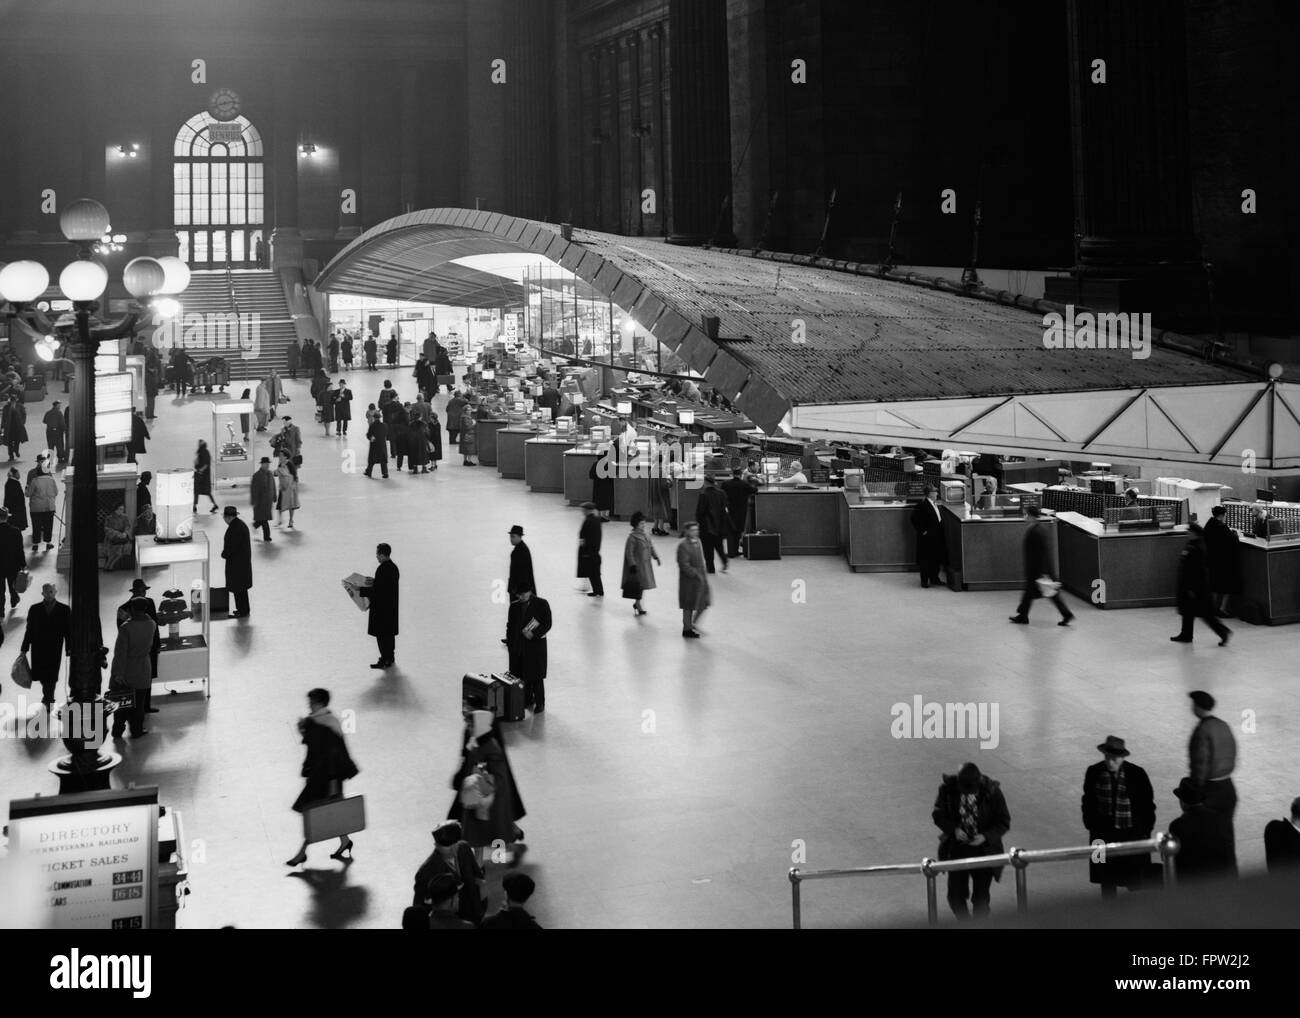 1950s 1960s RAILROAD TICKET COUNTER PENNSYLVANIA STATION DEMOLISHED 1966 NEW YORK CITY USA - Stock Image